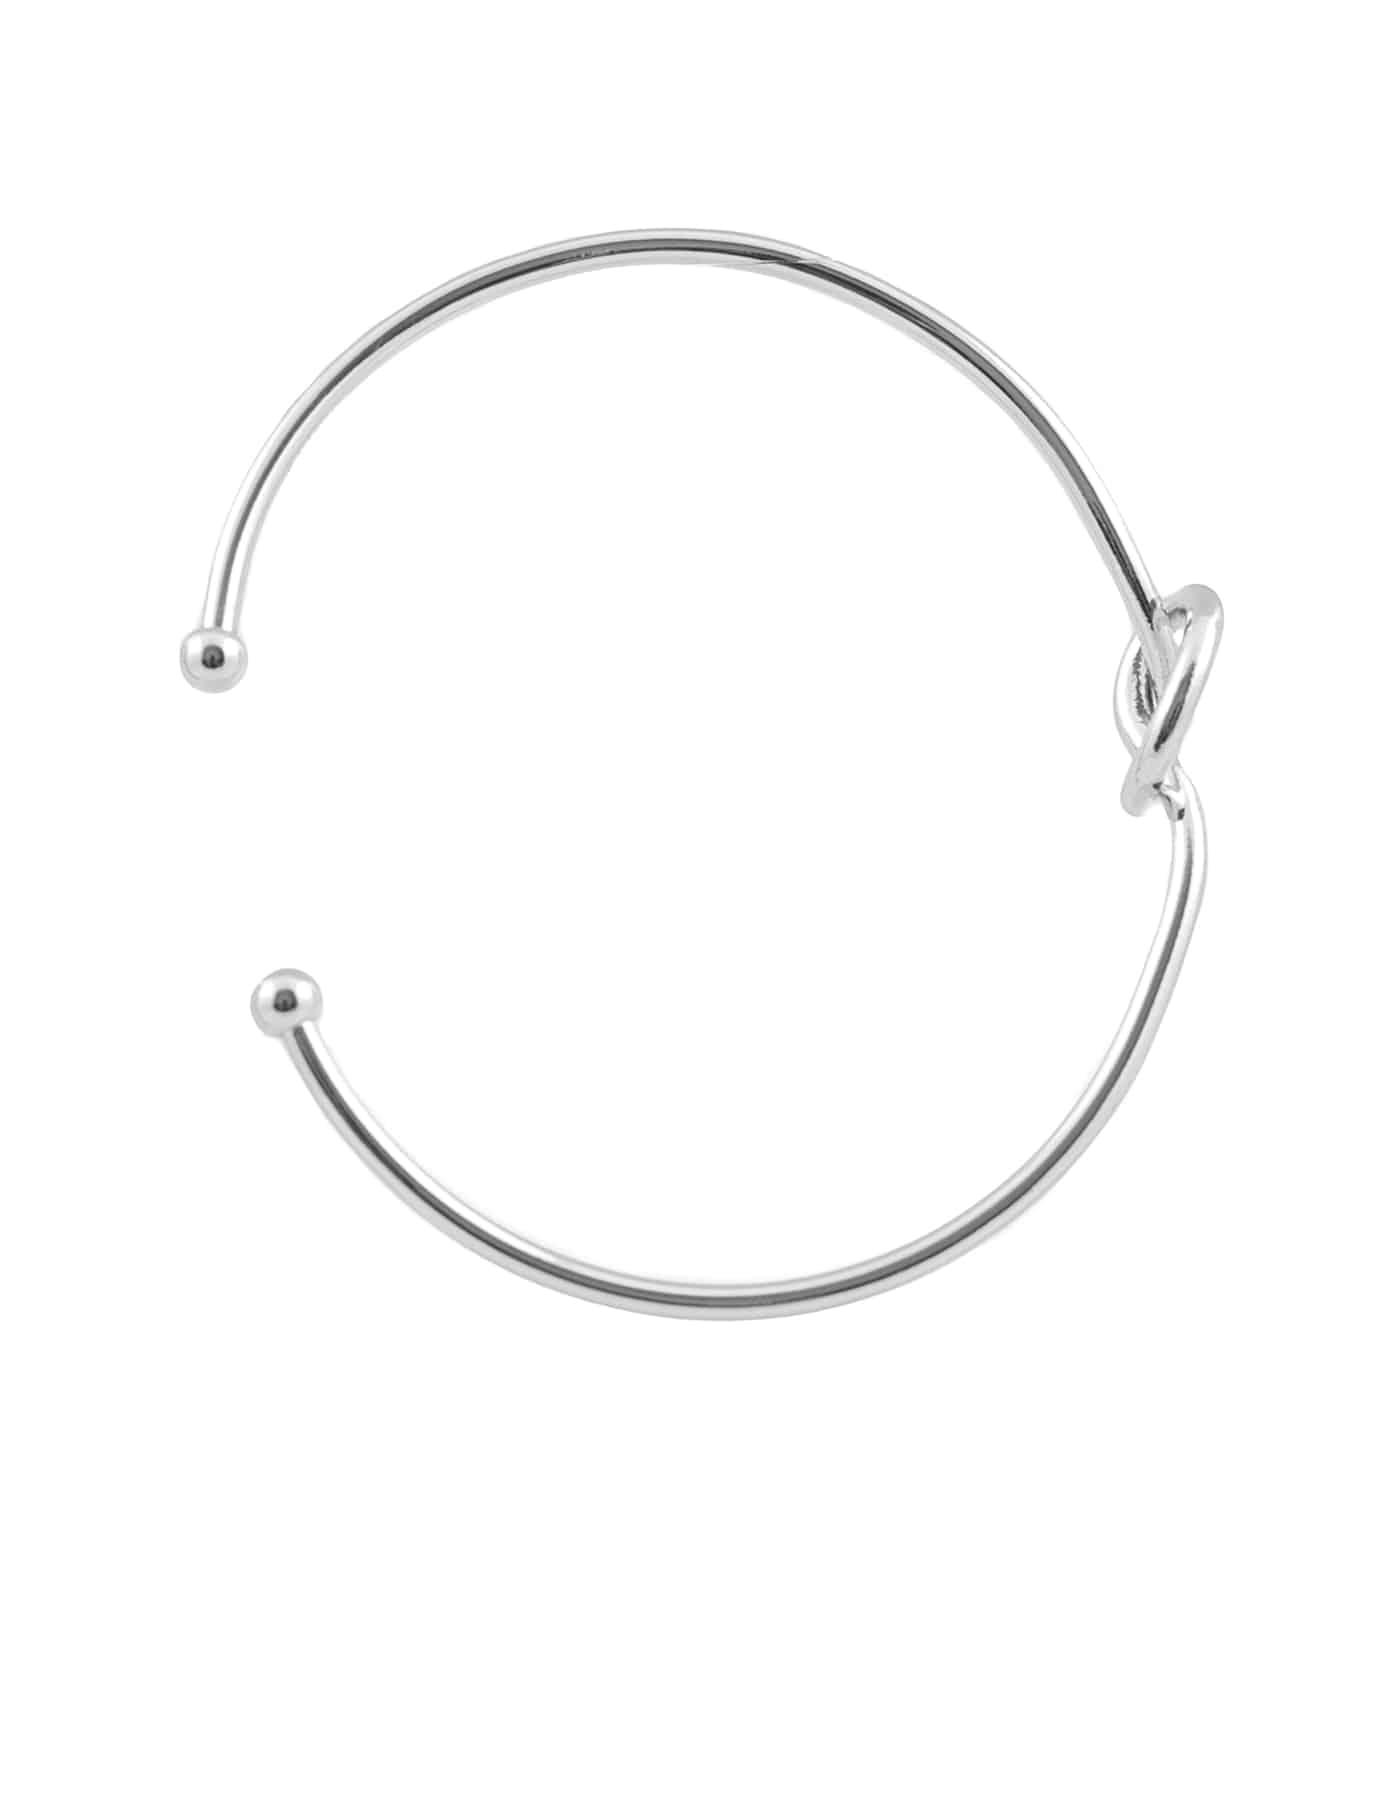 Silver Knot Bangle